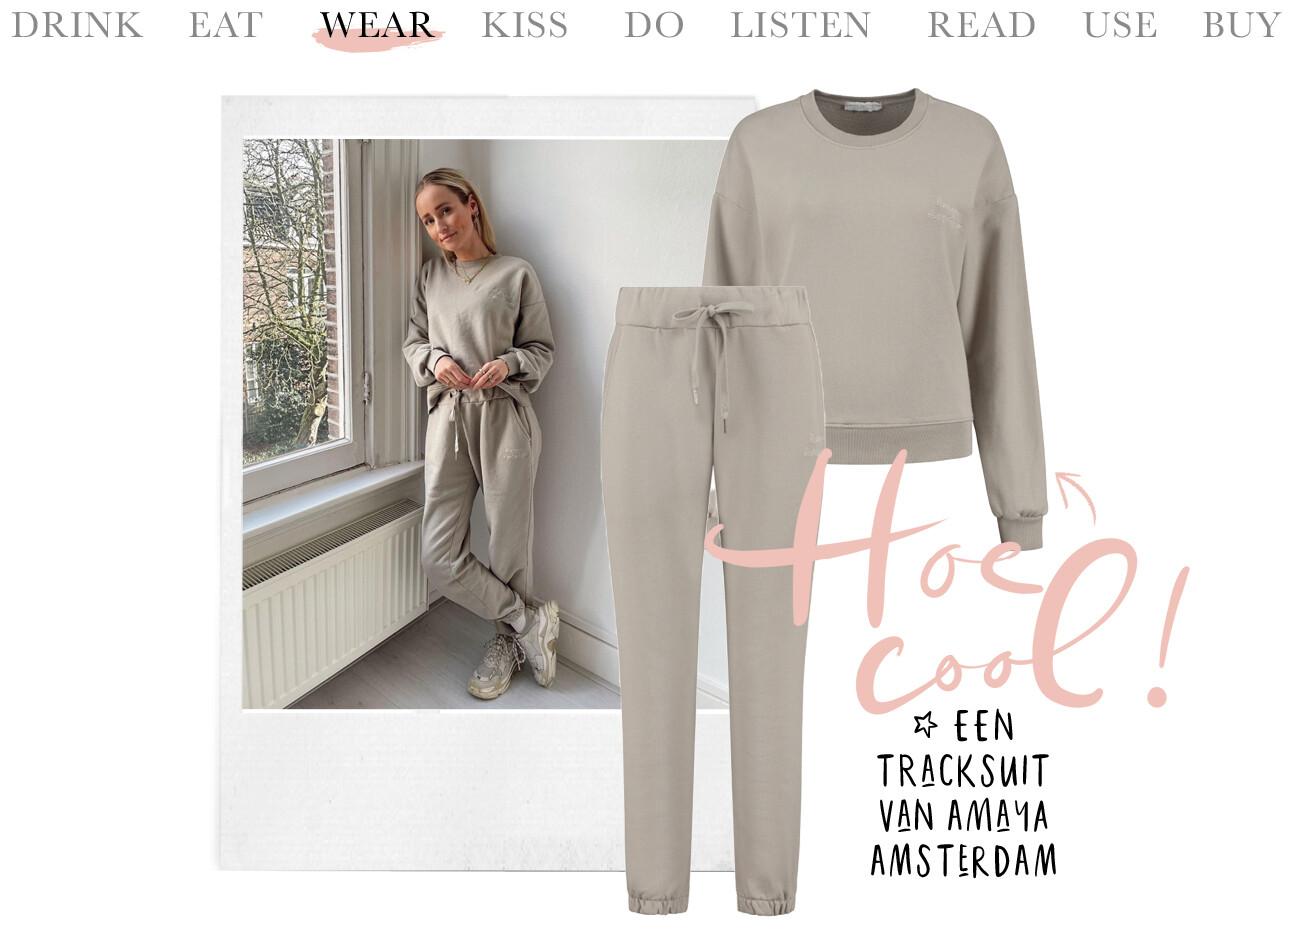 Tracksuit van Amaya Amsterdam